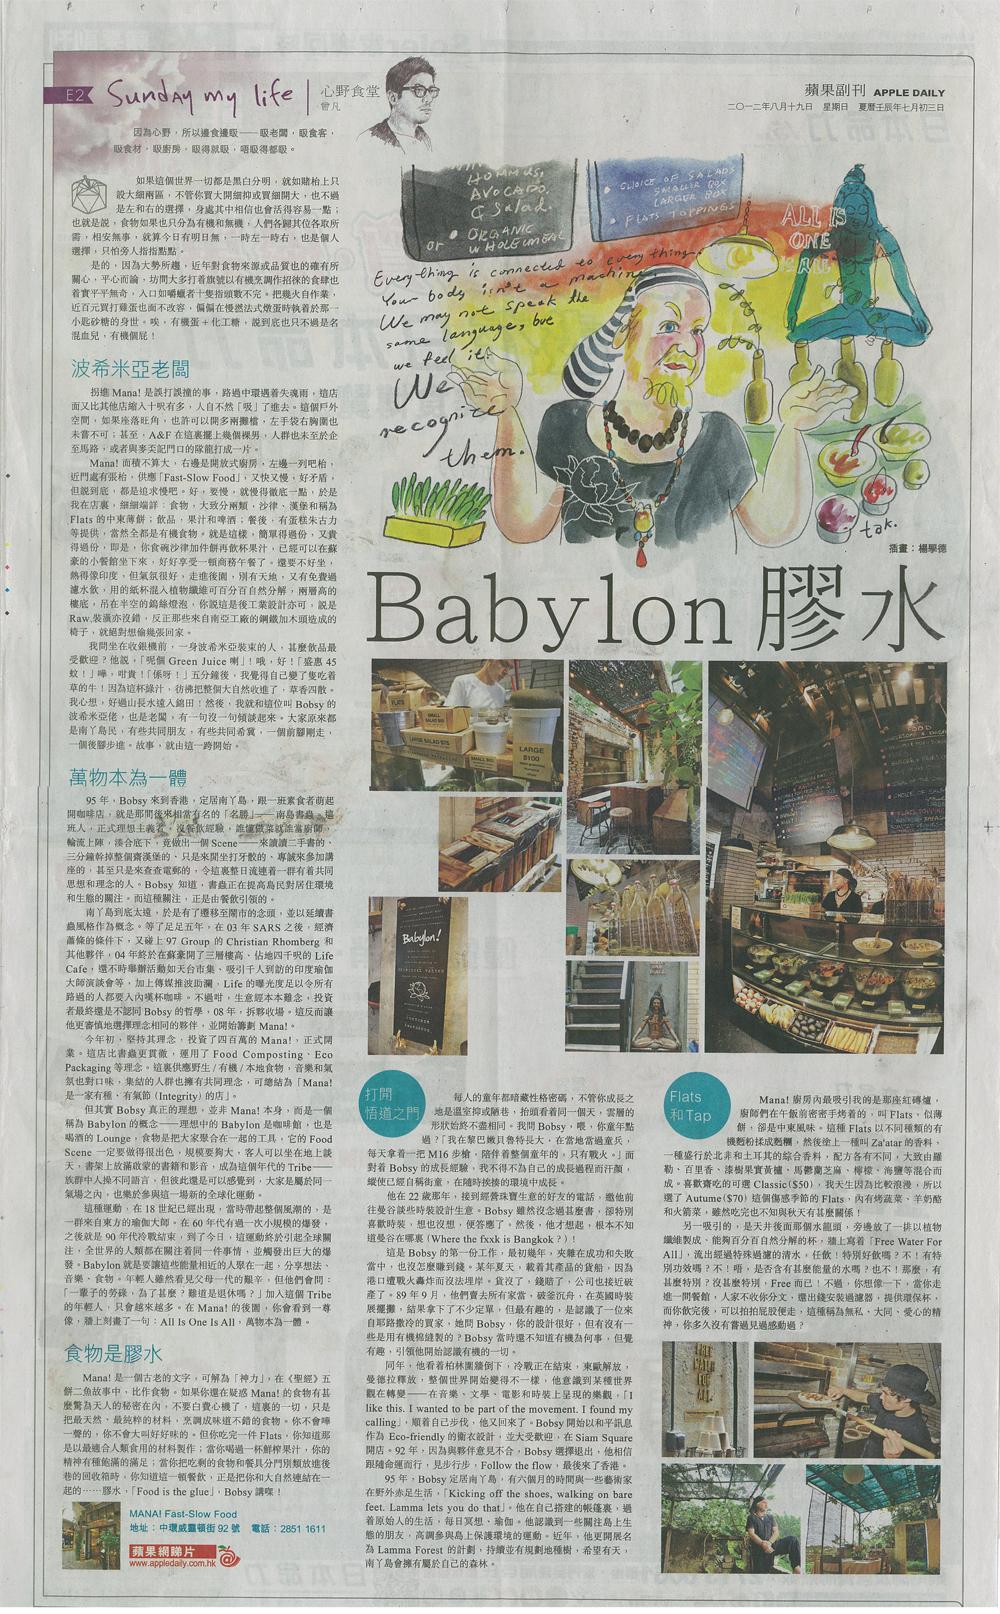 2012-08 Apple Daily 01.jpg